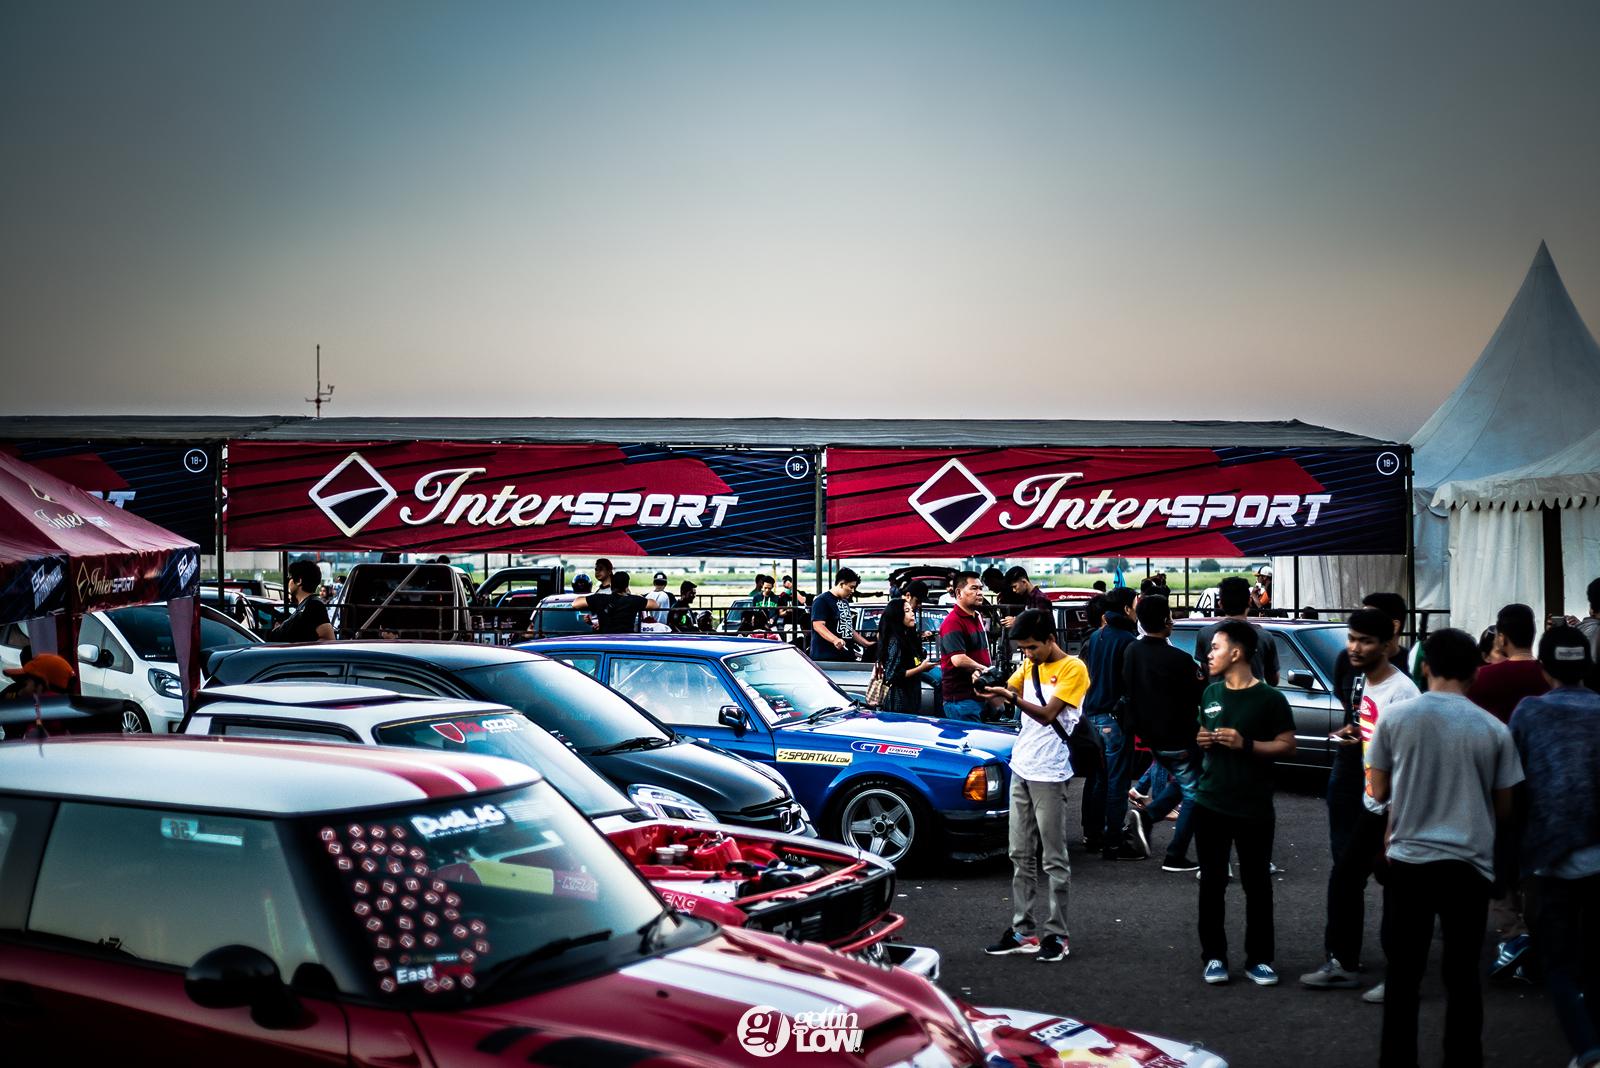 INTERSport Bandung